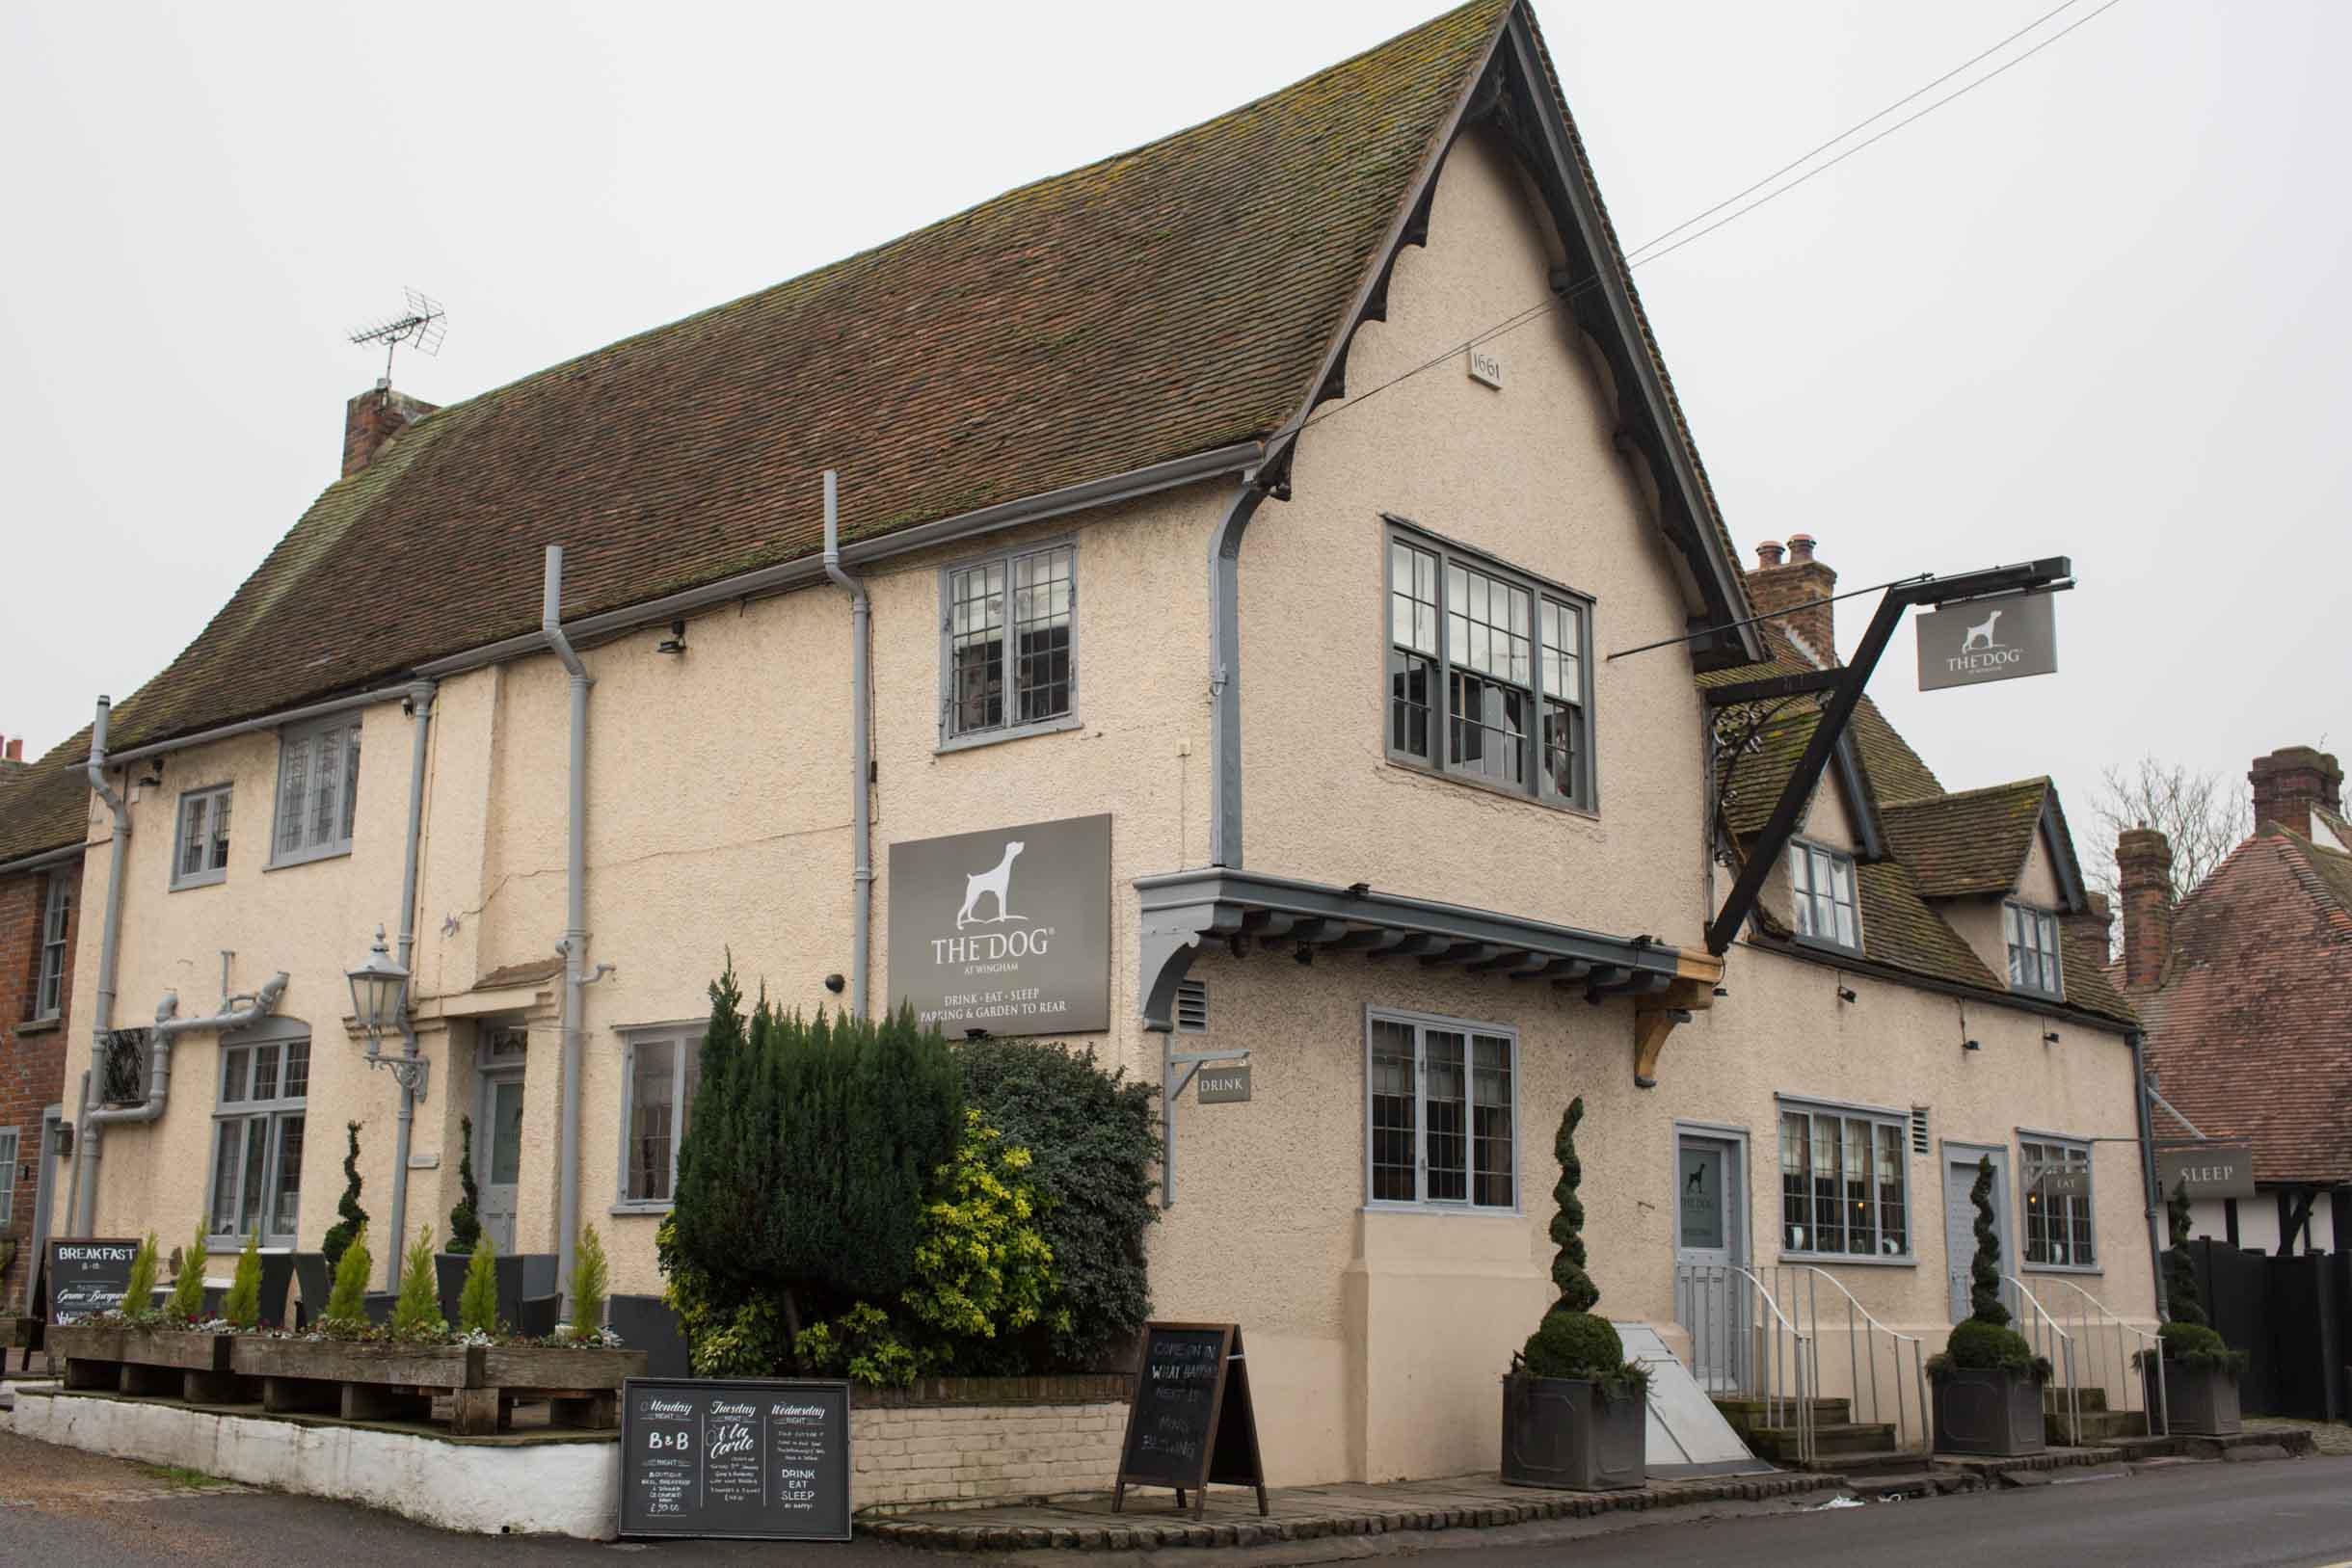 The Dog pub Wingham